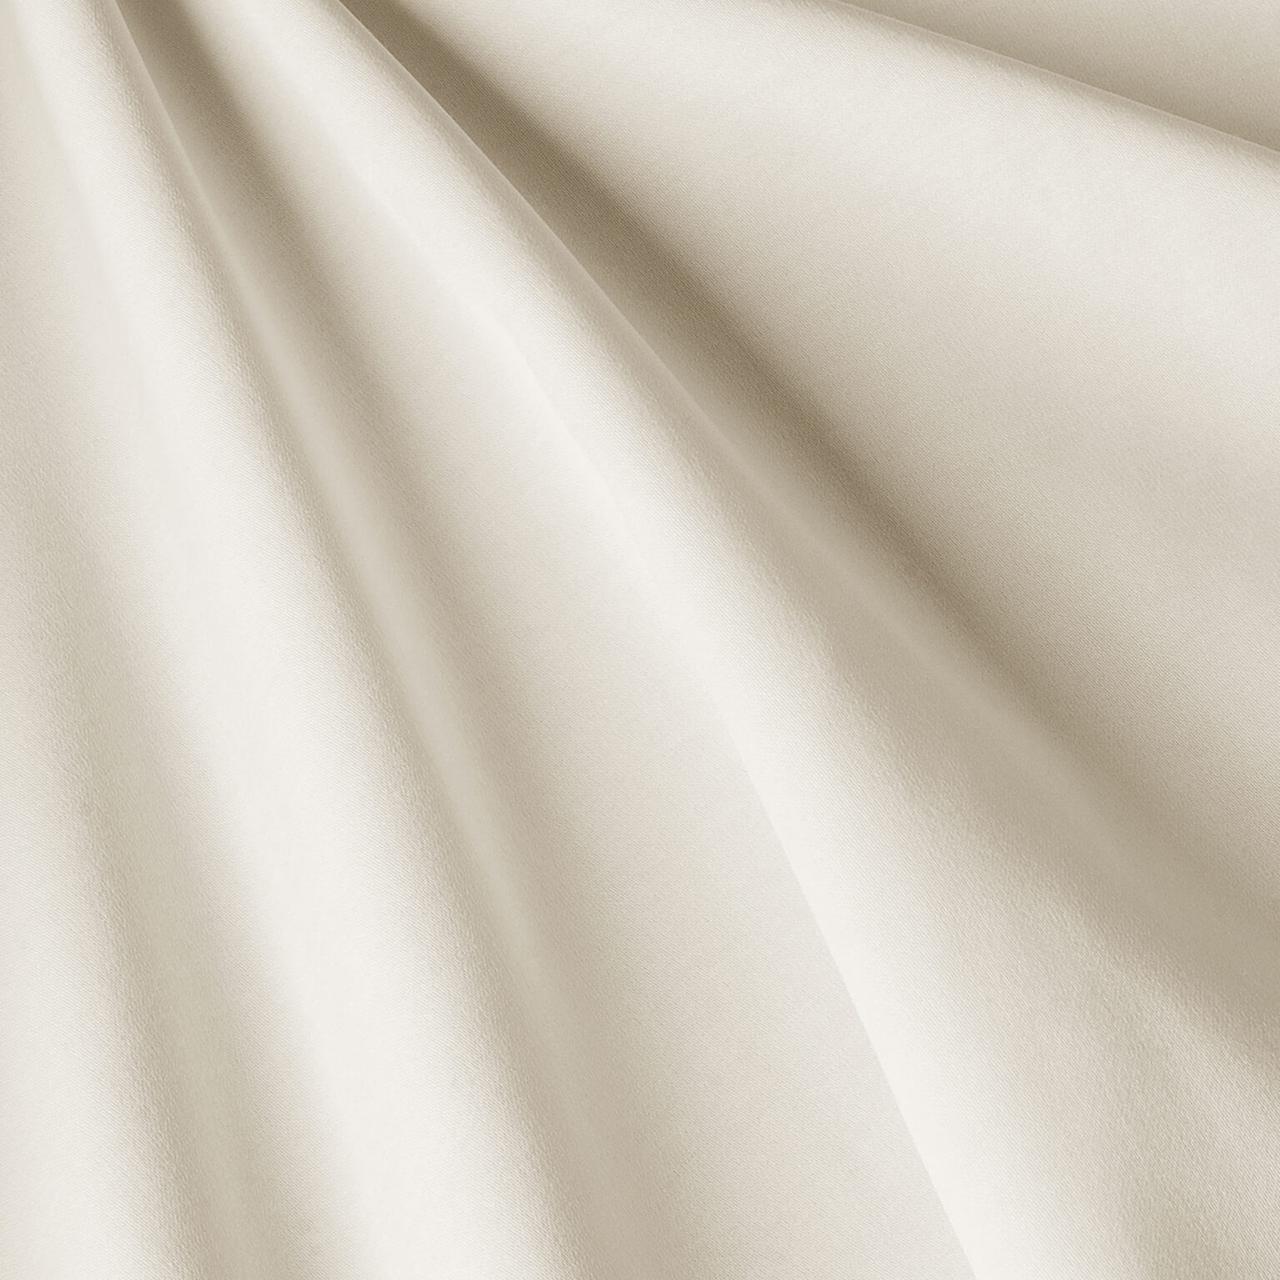 Ткань для скатертей и салфеток (ресторан) 81539v2